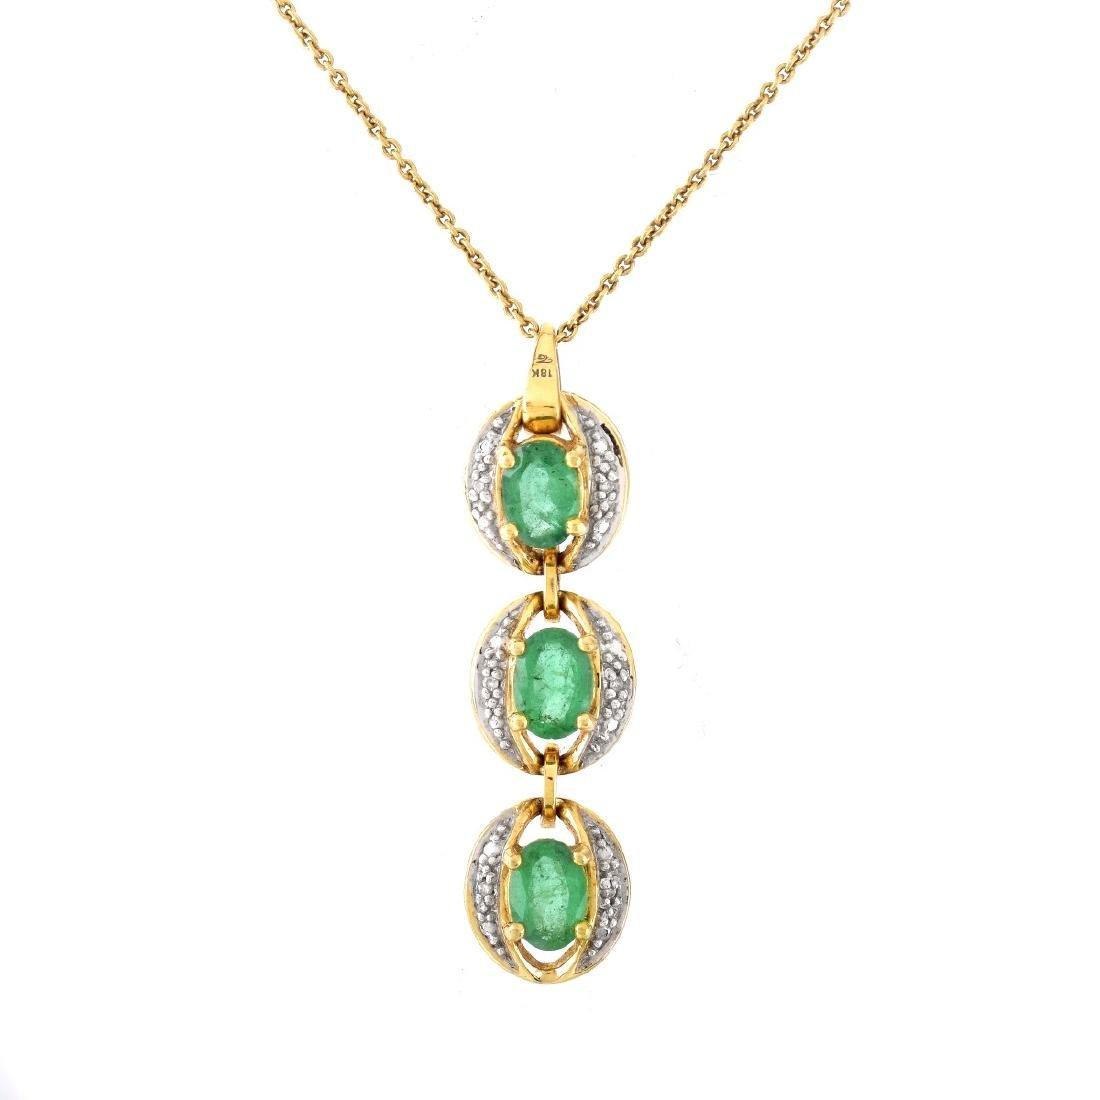 Emerald, Diamond and 18K Gold Pendant Necklace